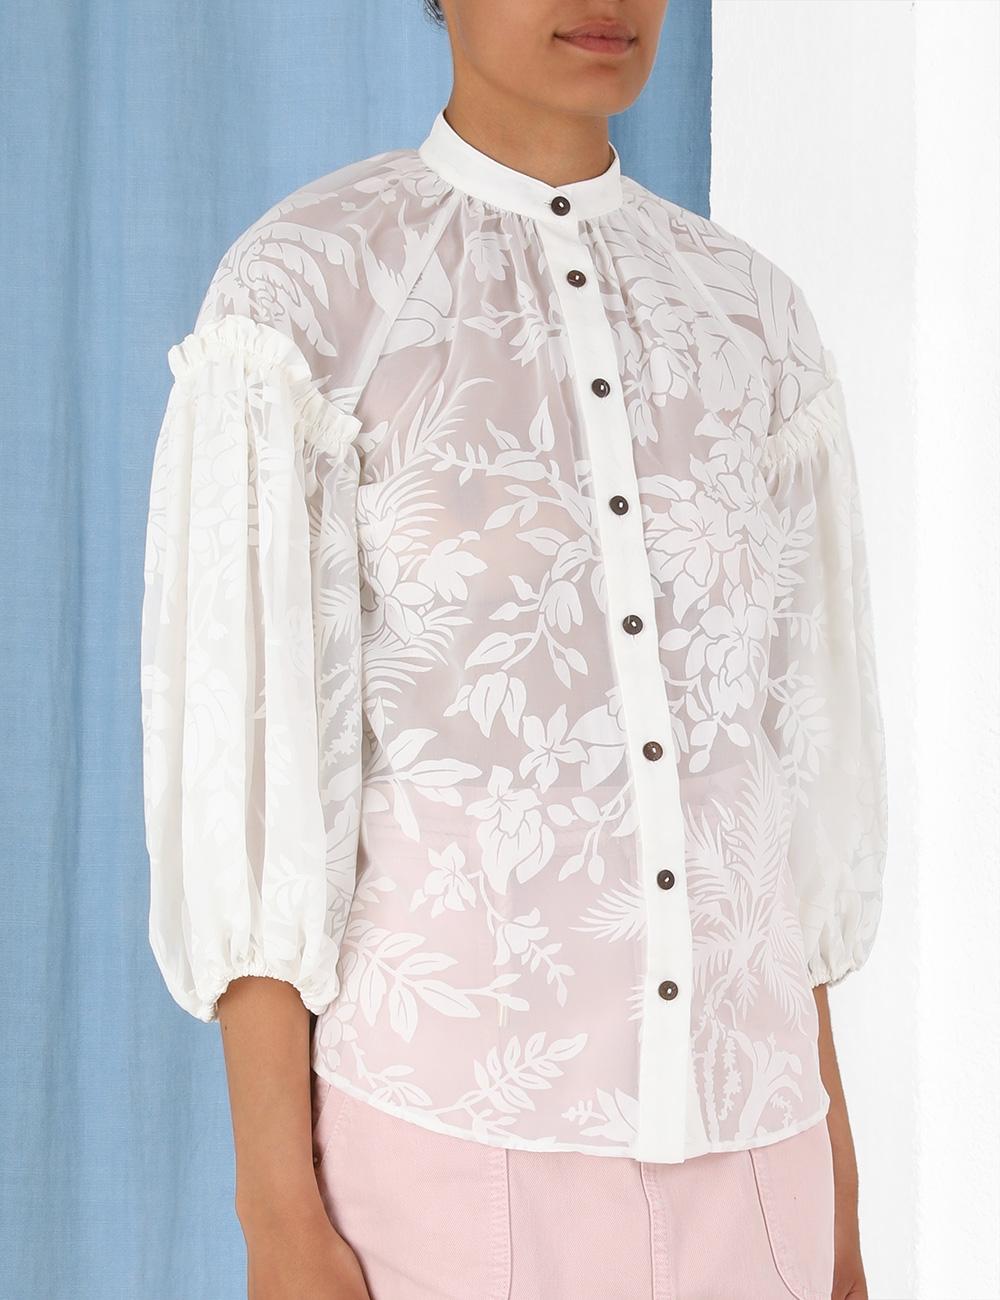 Tropicana Lantern Shirt